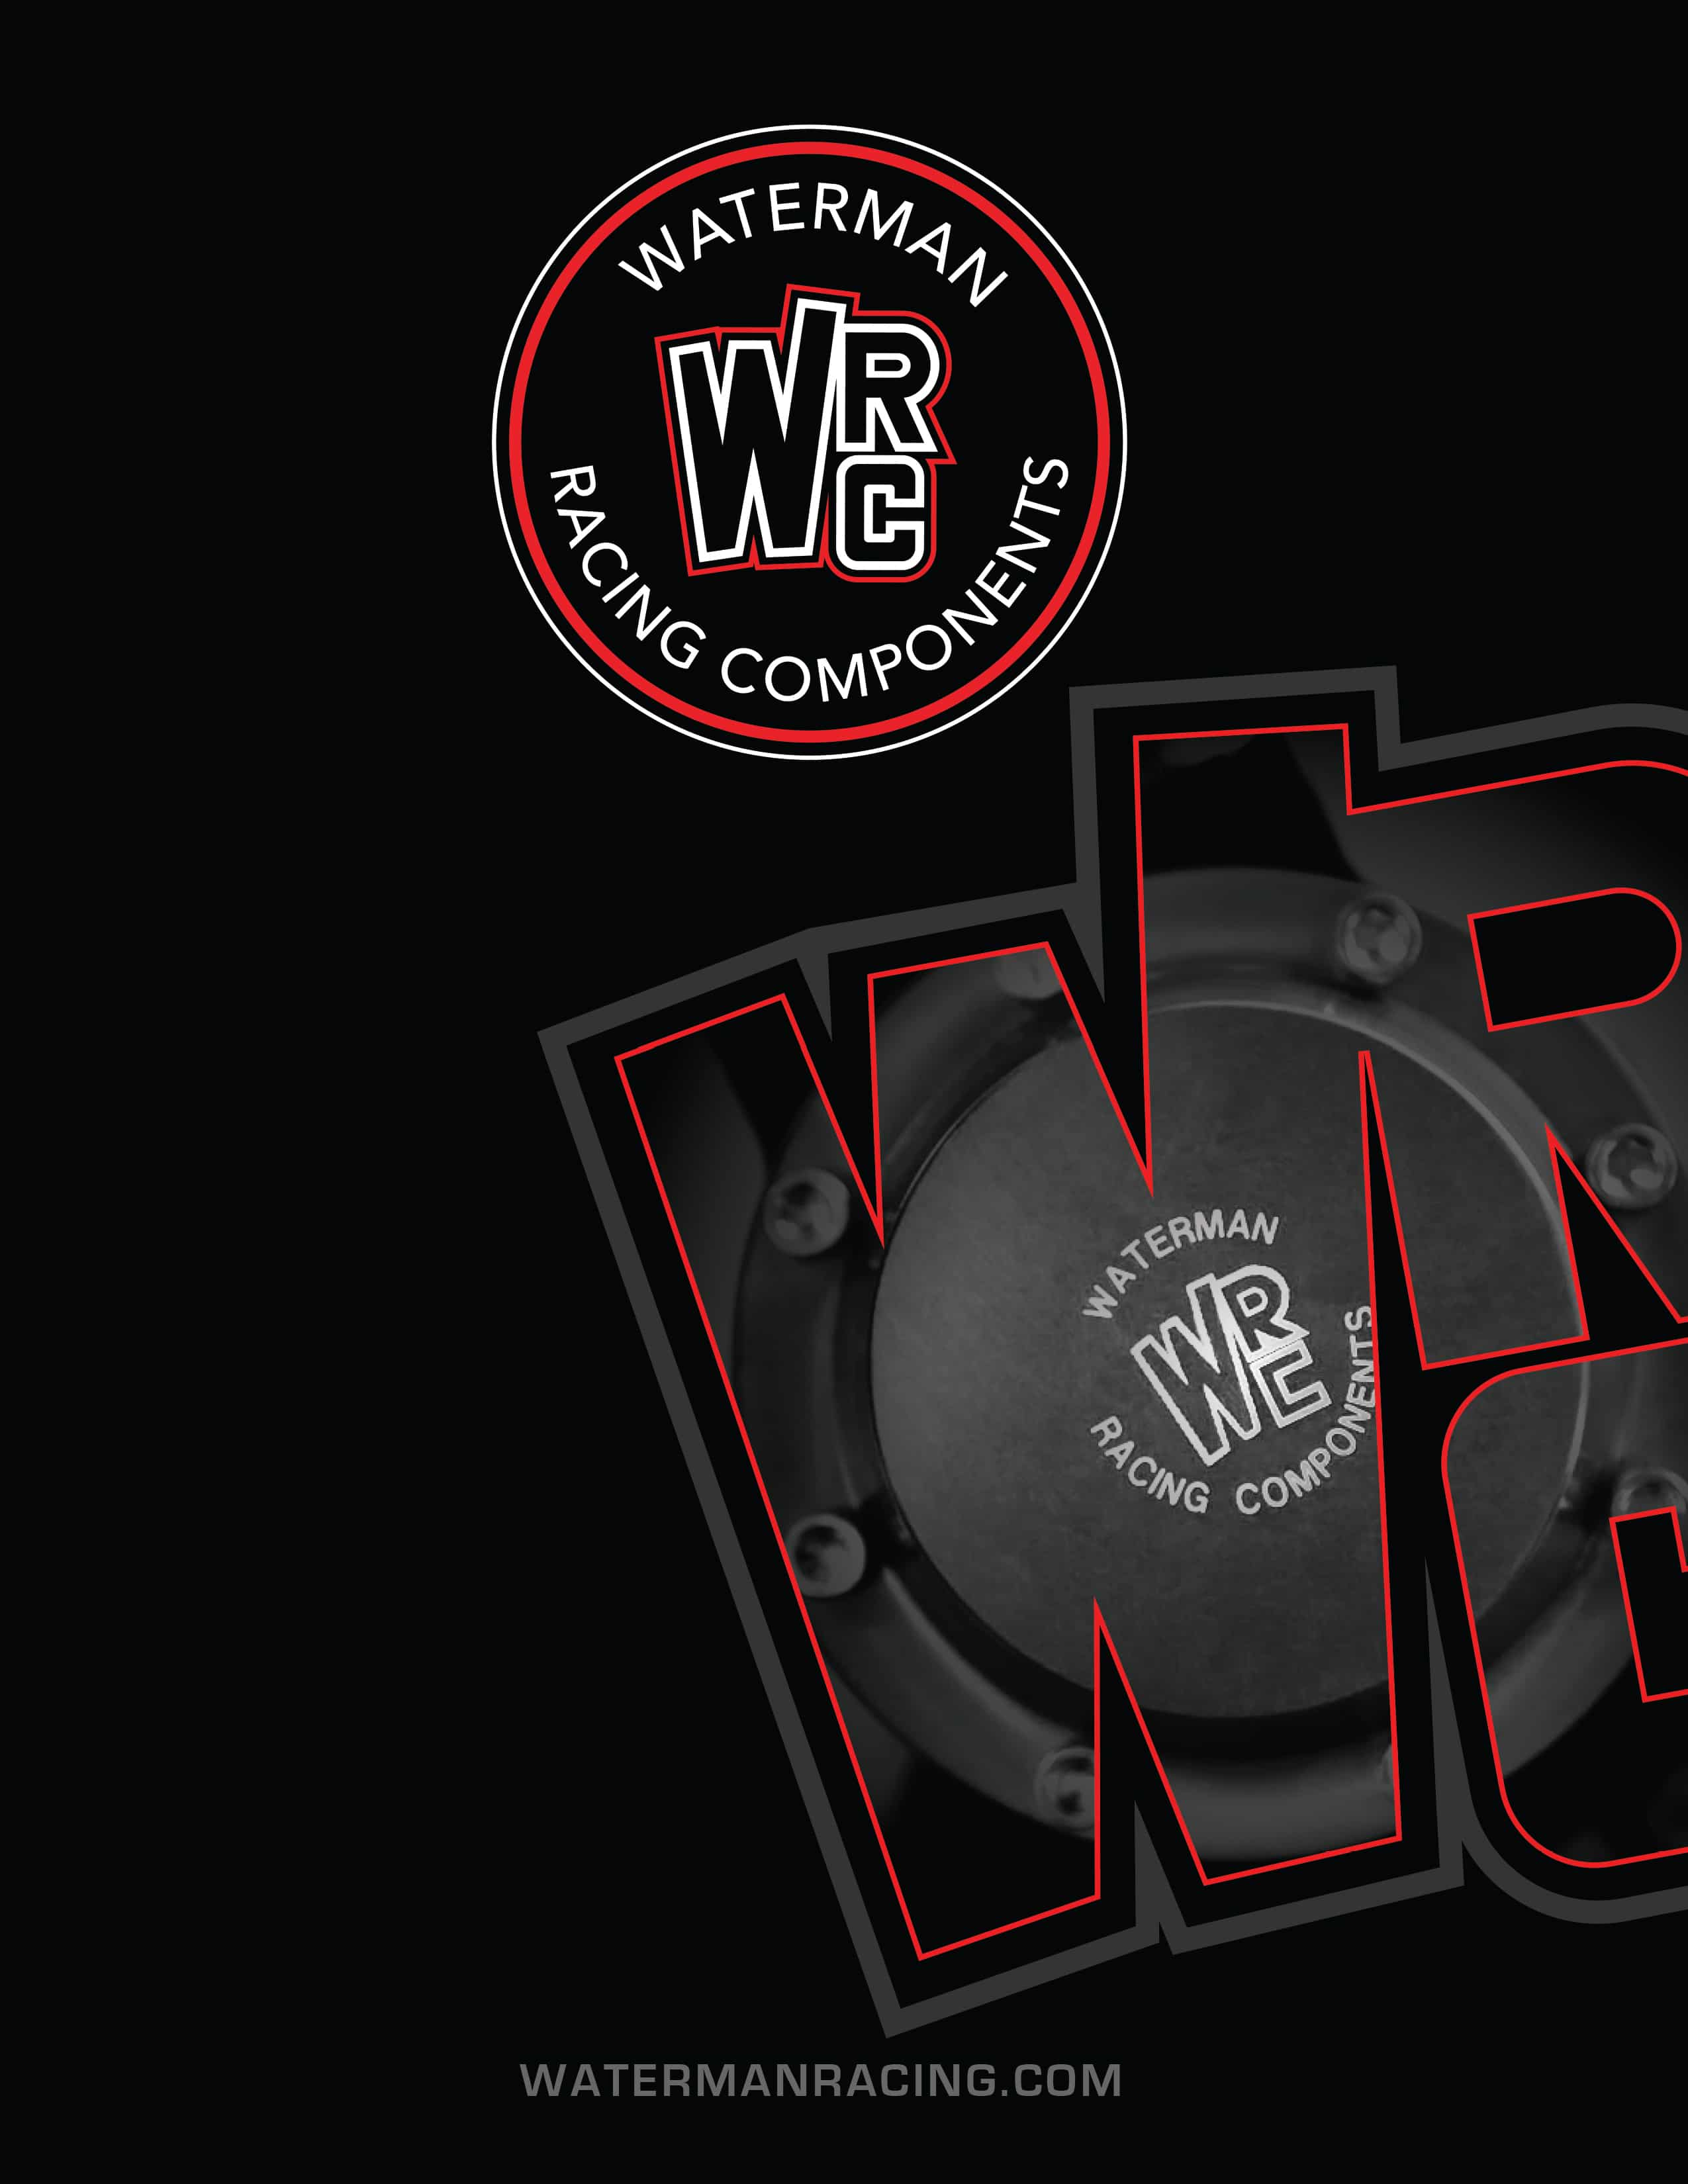 WRC_showcase_book (2) (1)_Page_1